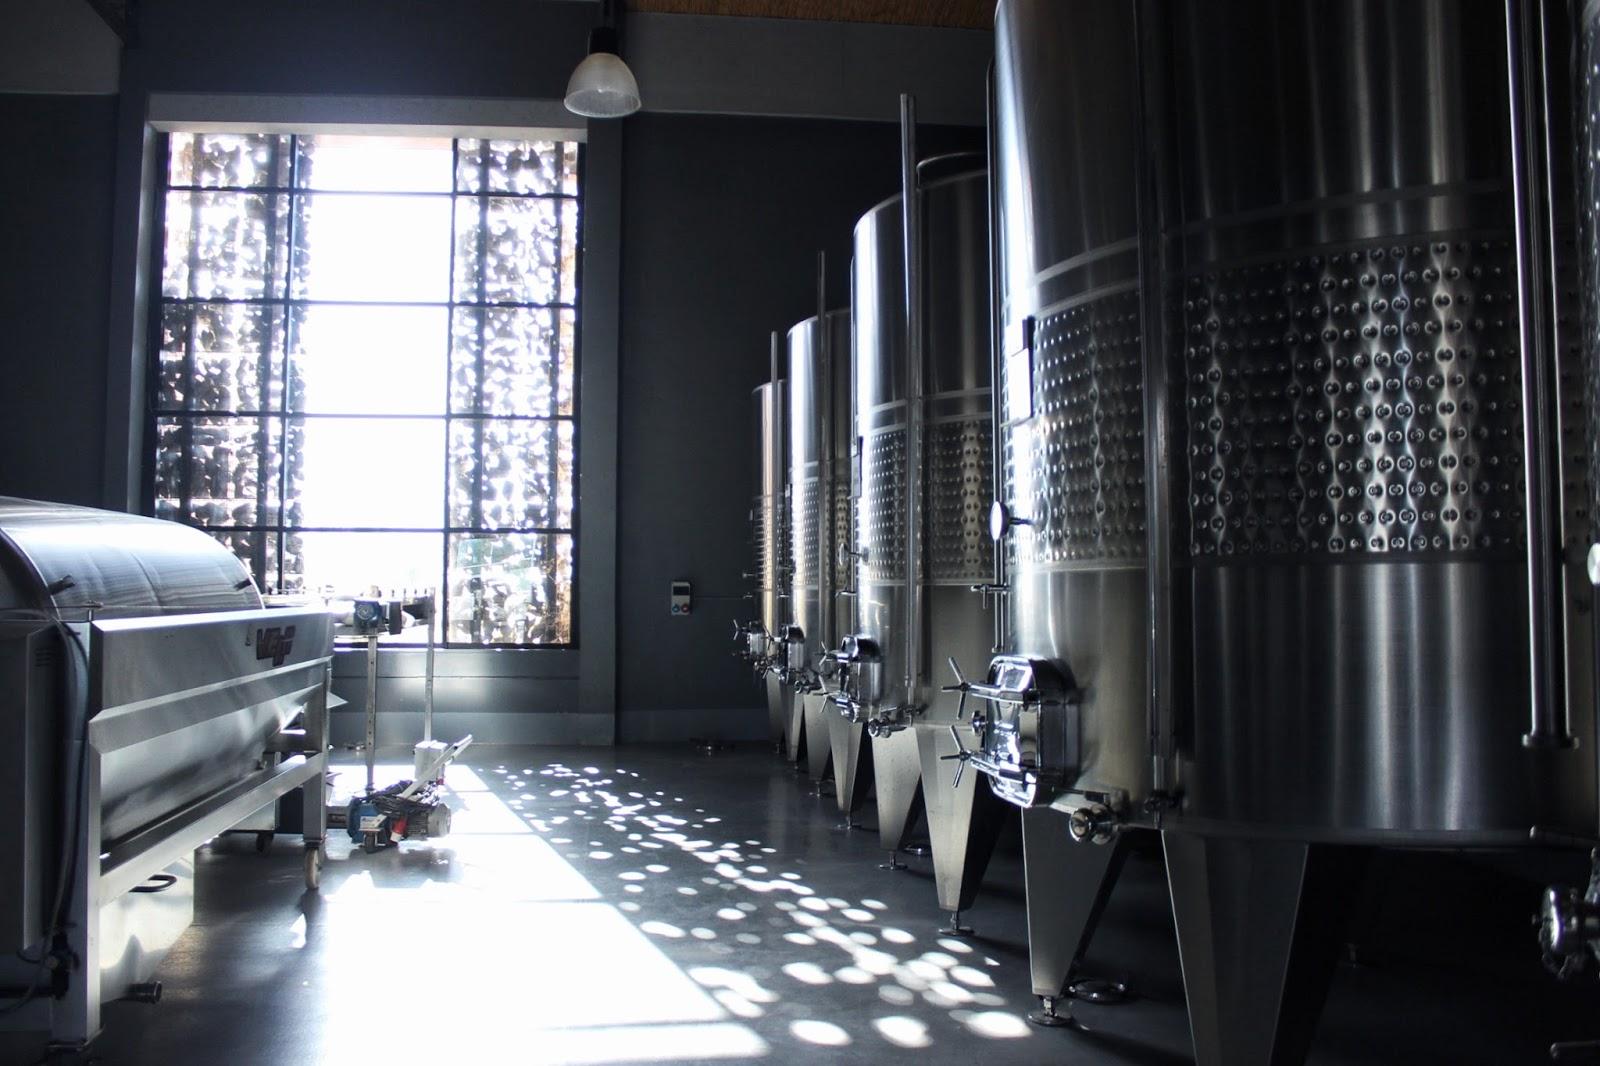 lifesthayle-wine-time-bodega-vistandes-barris.JPG